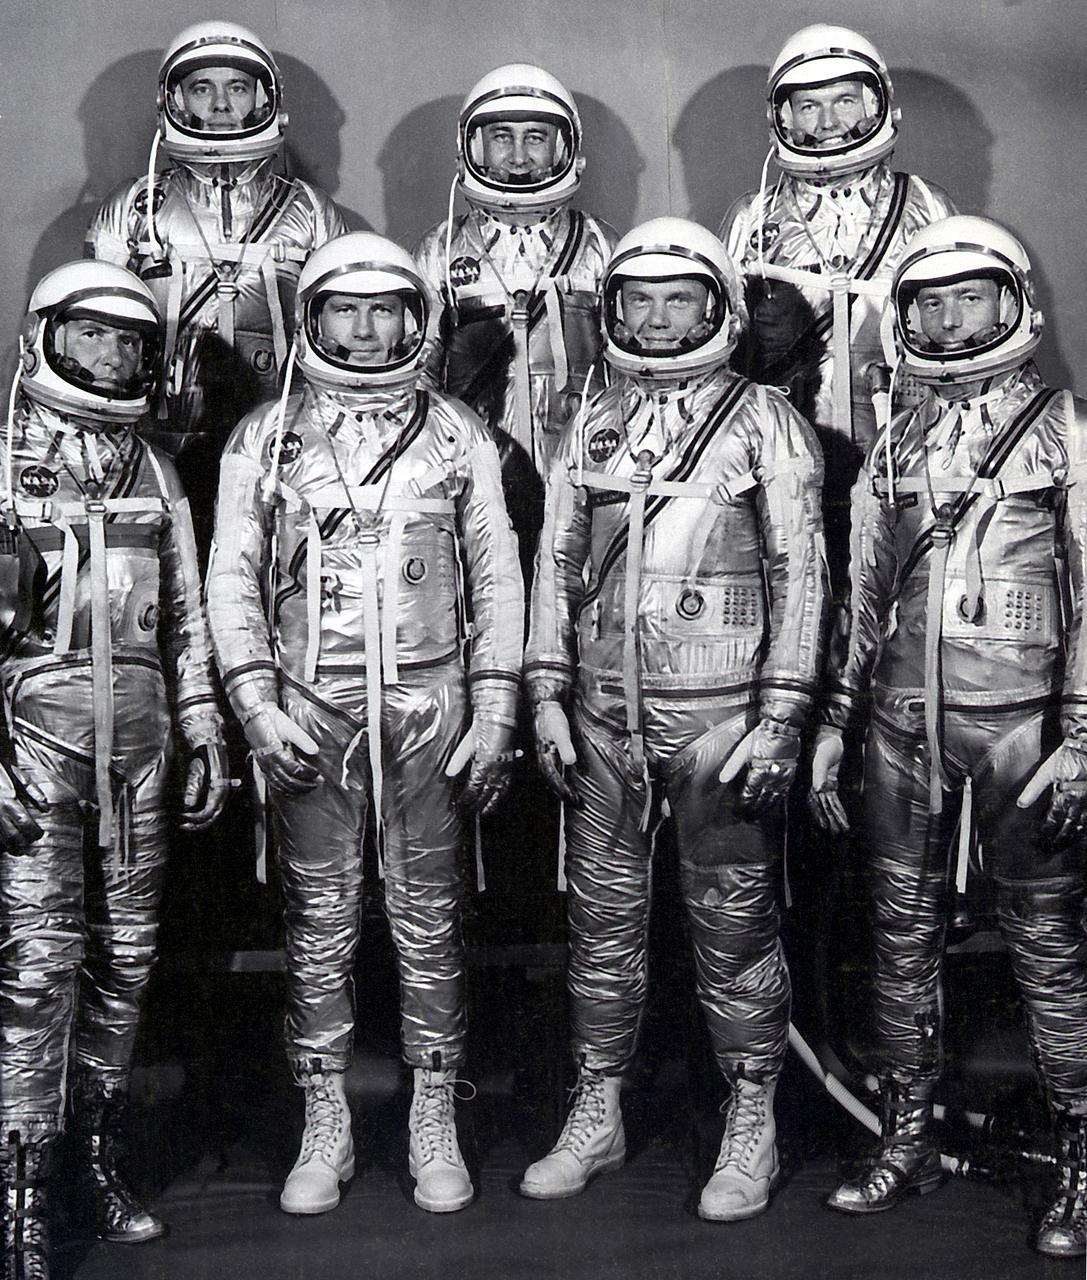 Mercury Astronauts who flew one by one